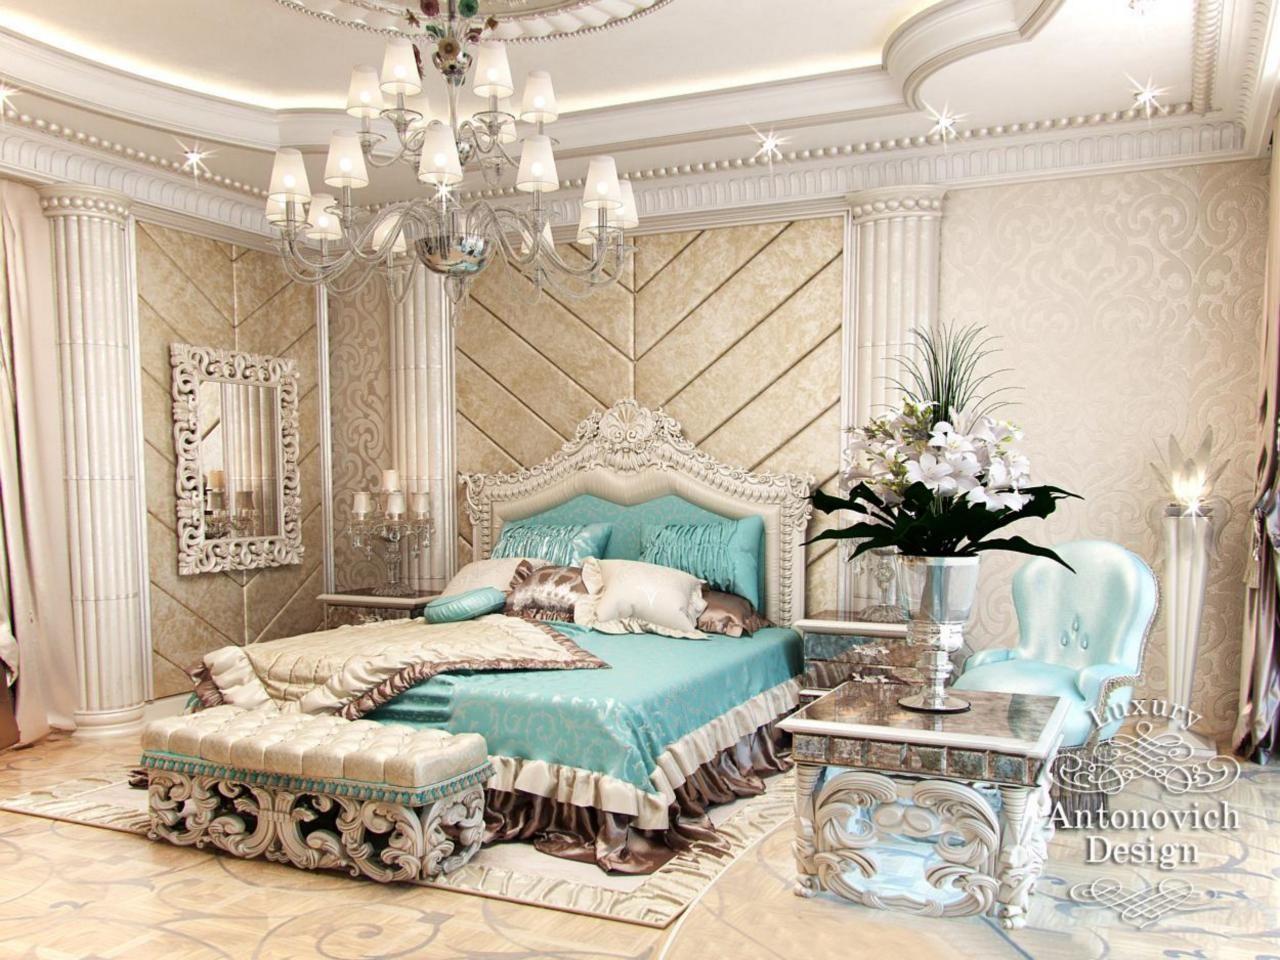 . Bedroom Design in Dubai  Interior Bedroom Abu Dhabi  Photo 5